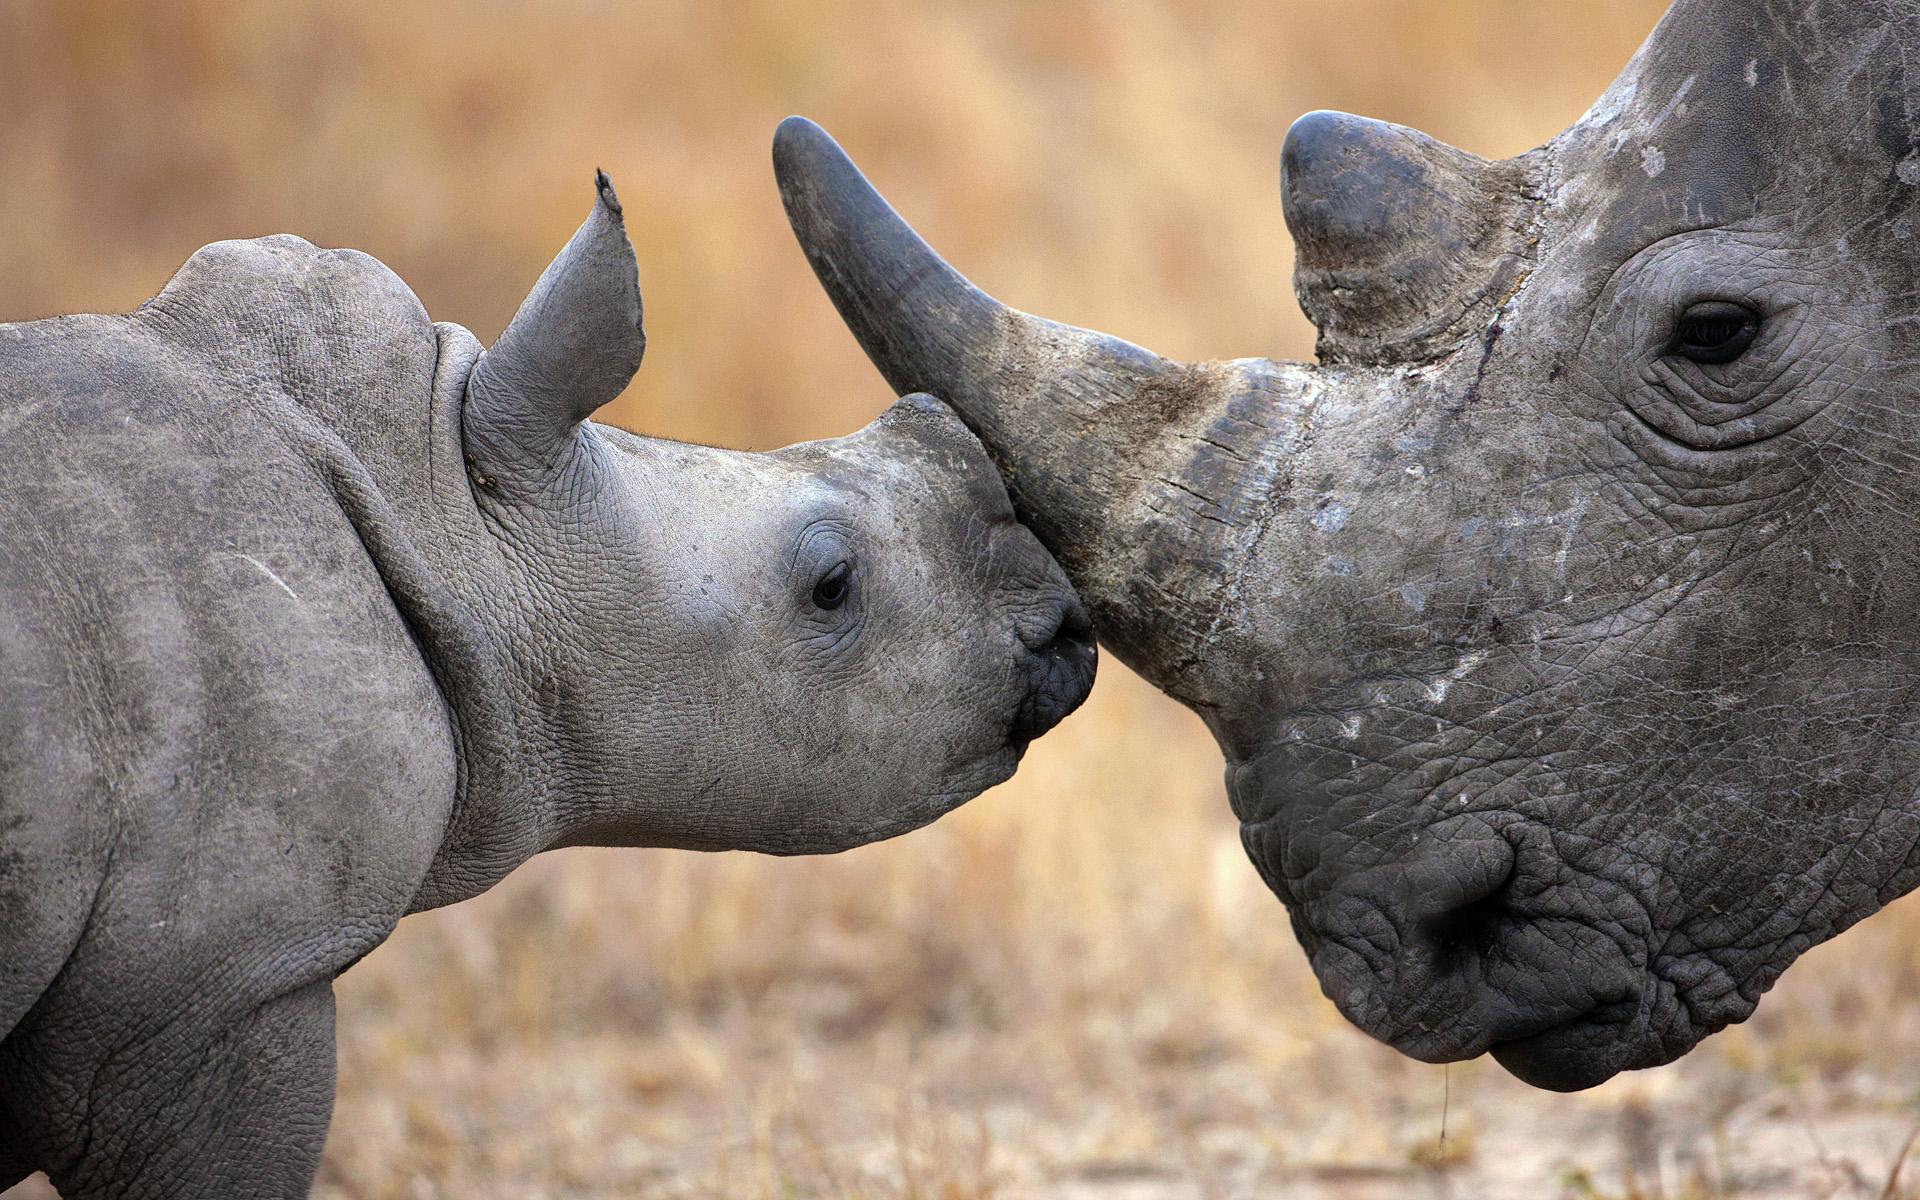 Cute Rhino Wallpaper